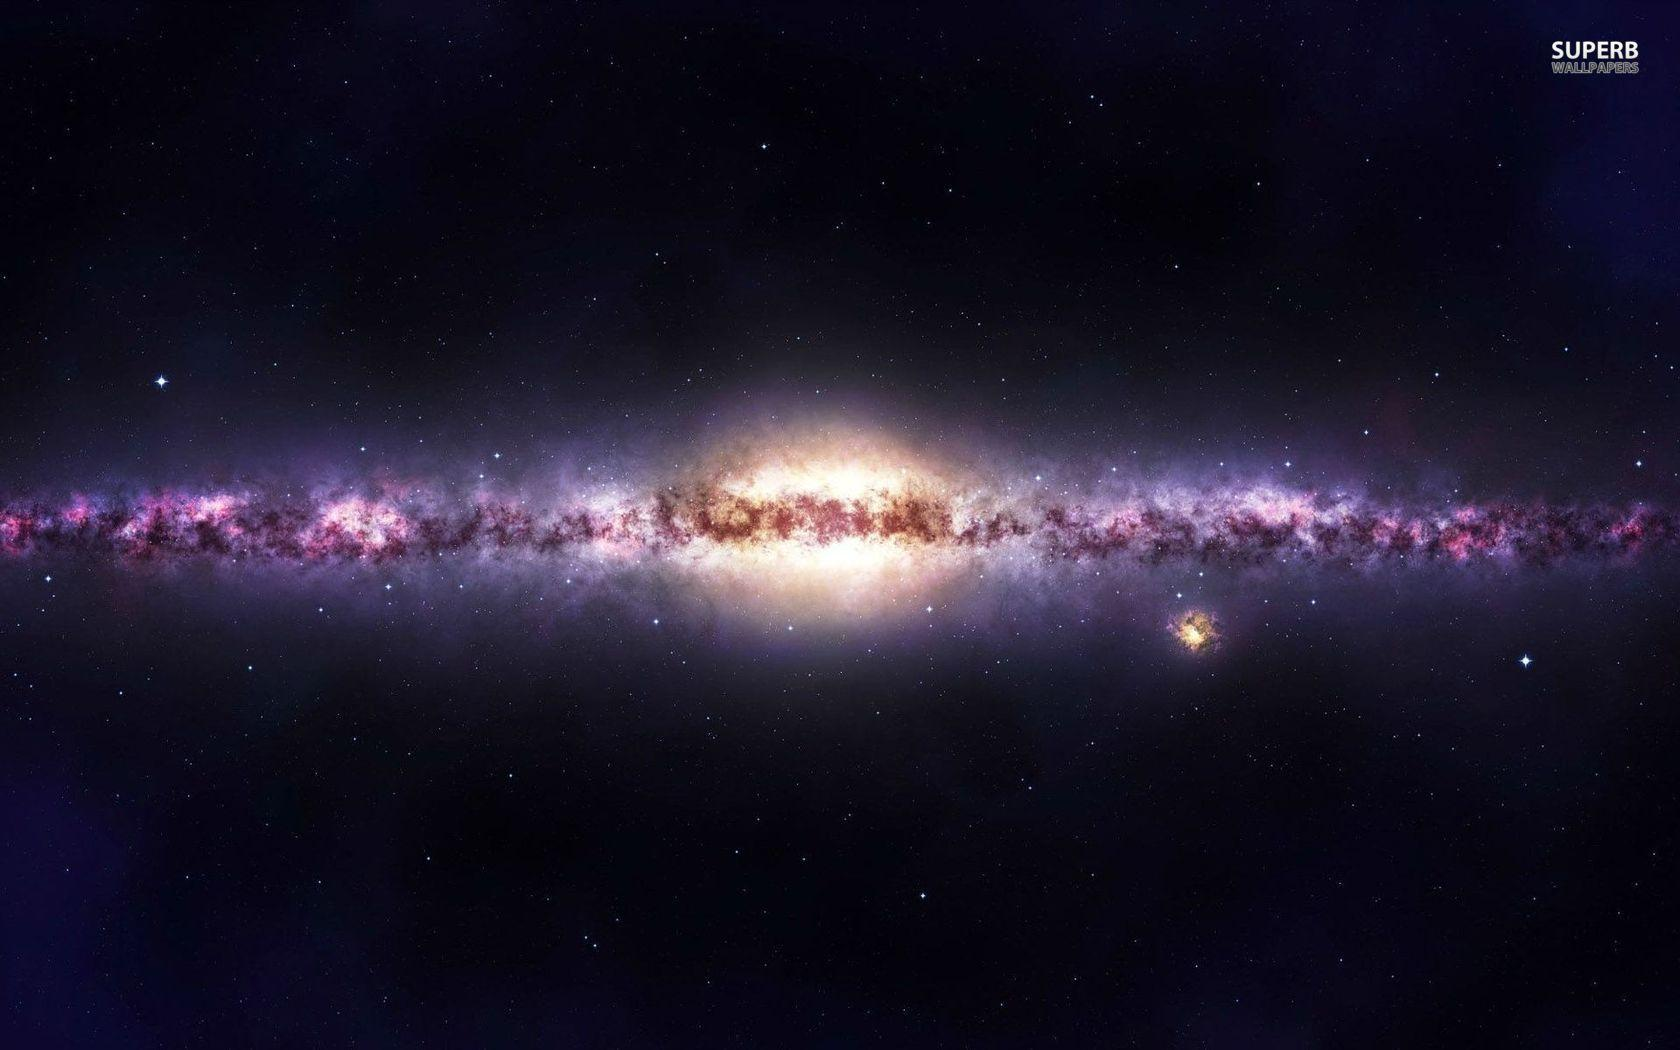 Wallpapers Milky Way Galaxy - Wallpaper Cave